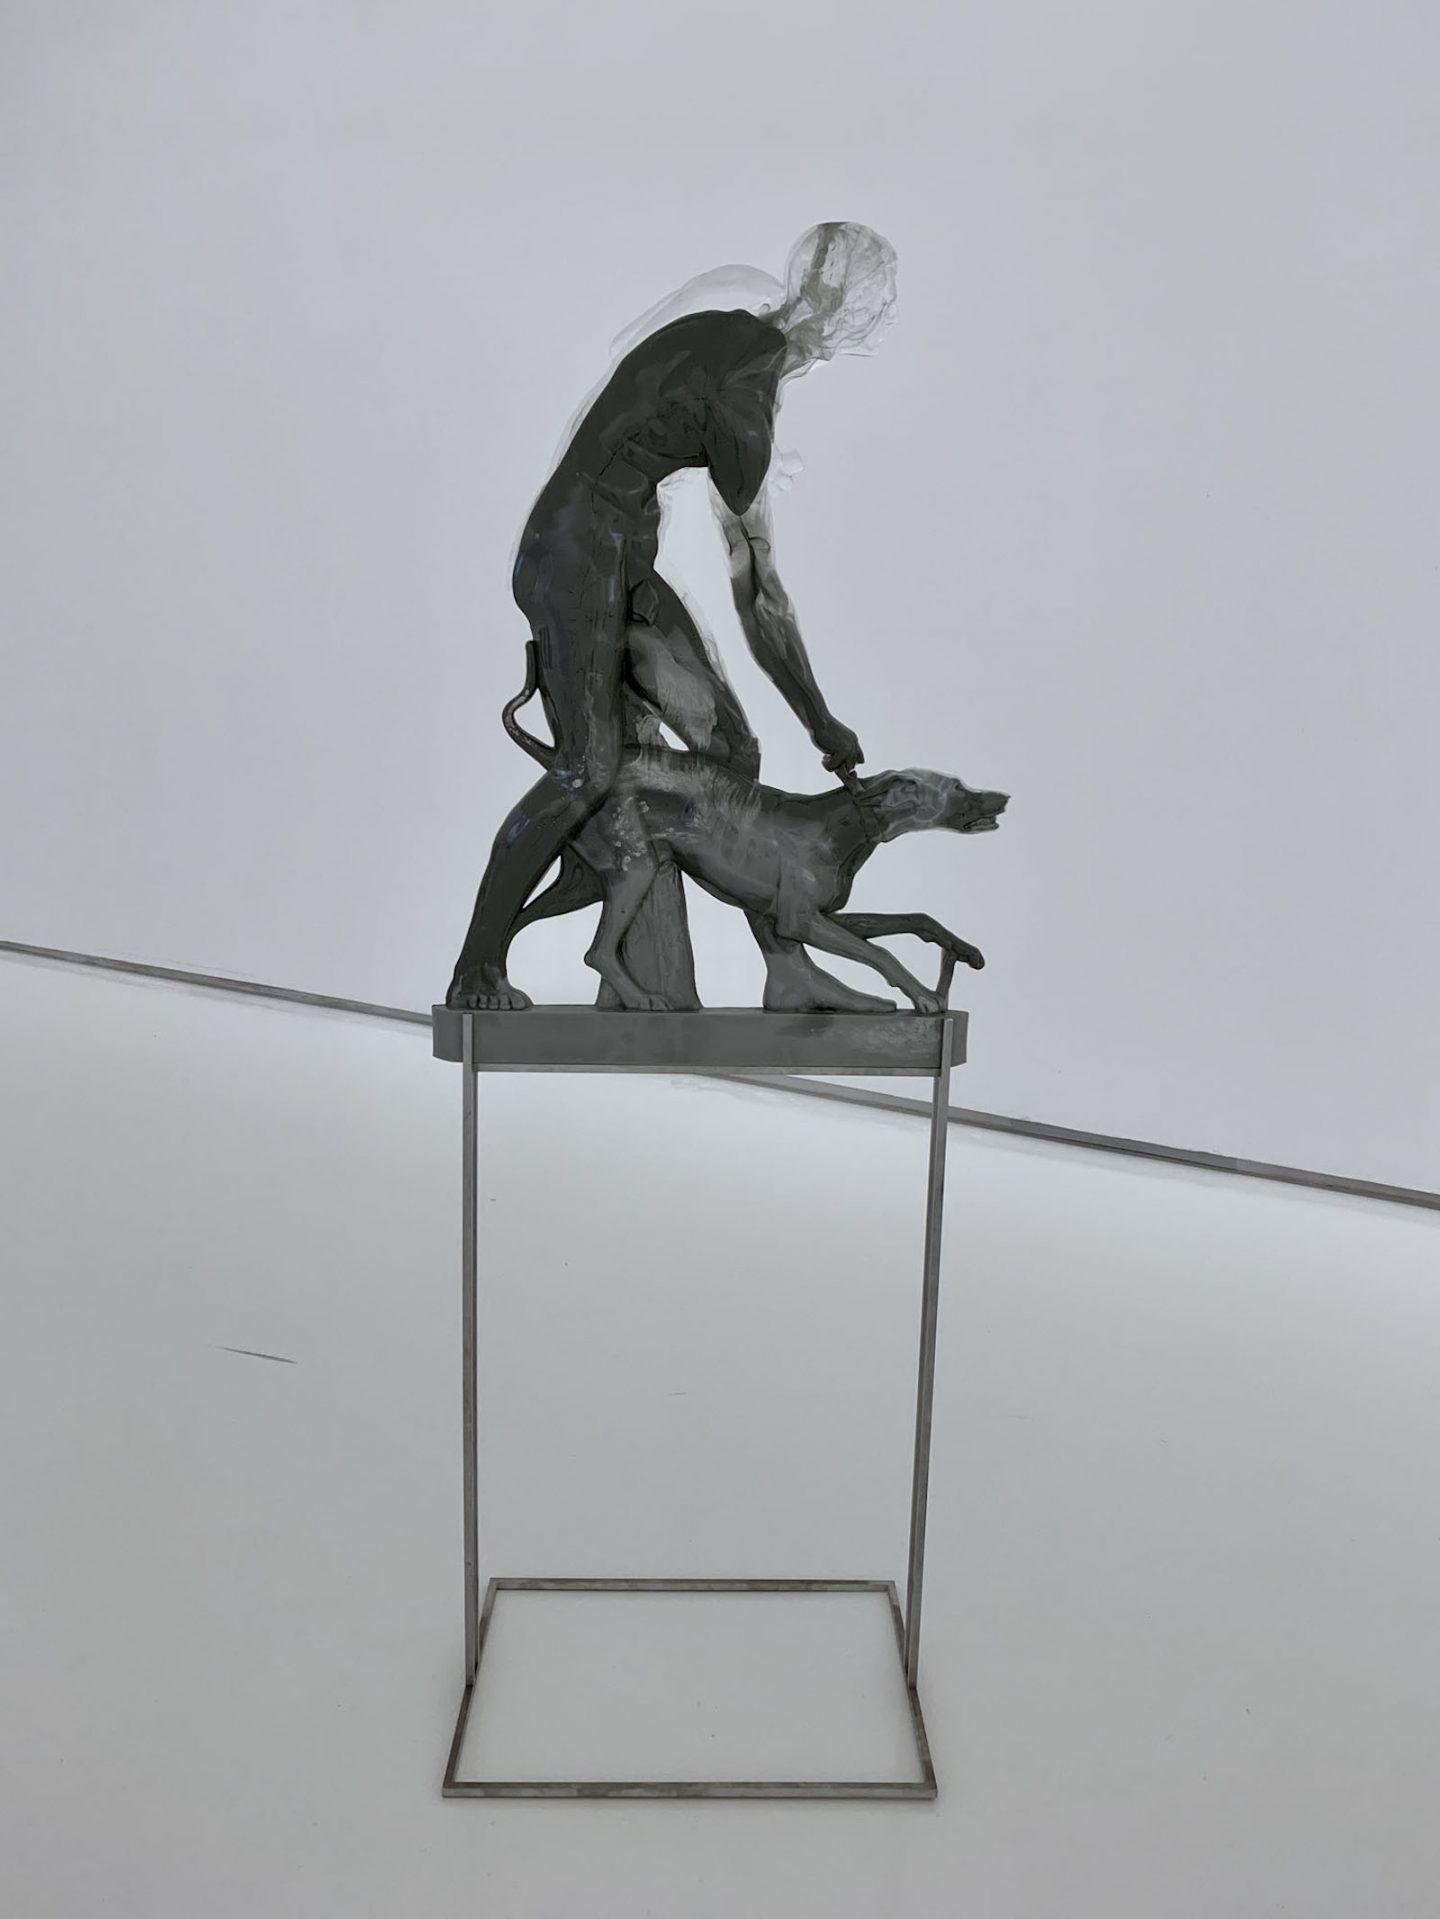 IGNANT-Art-Galeria-Duarte-Sequeira-Immortality-Future-016